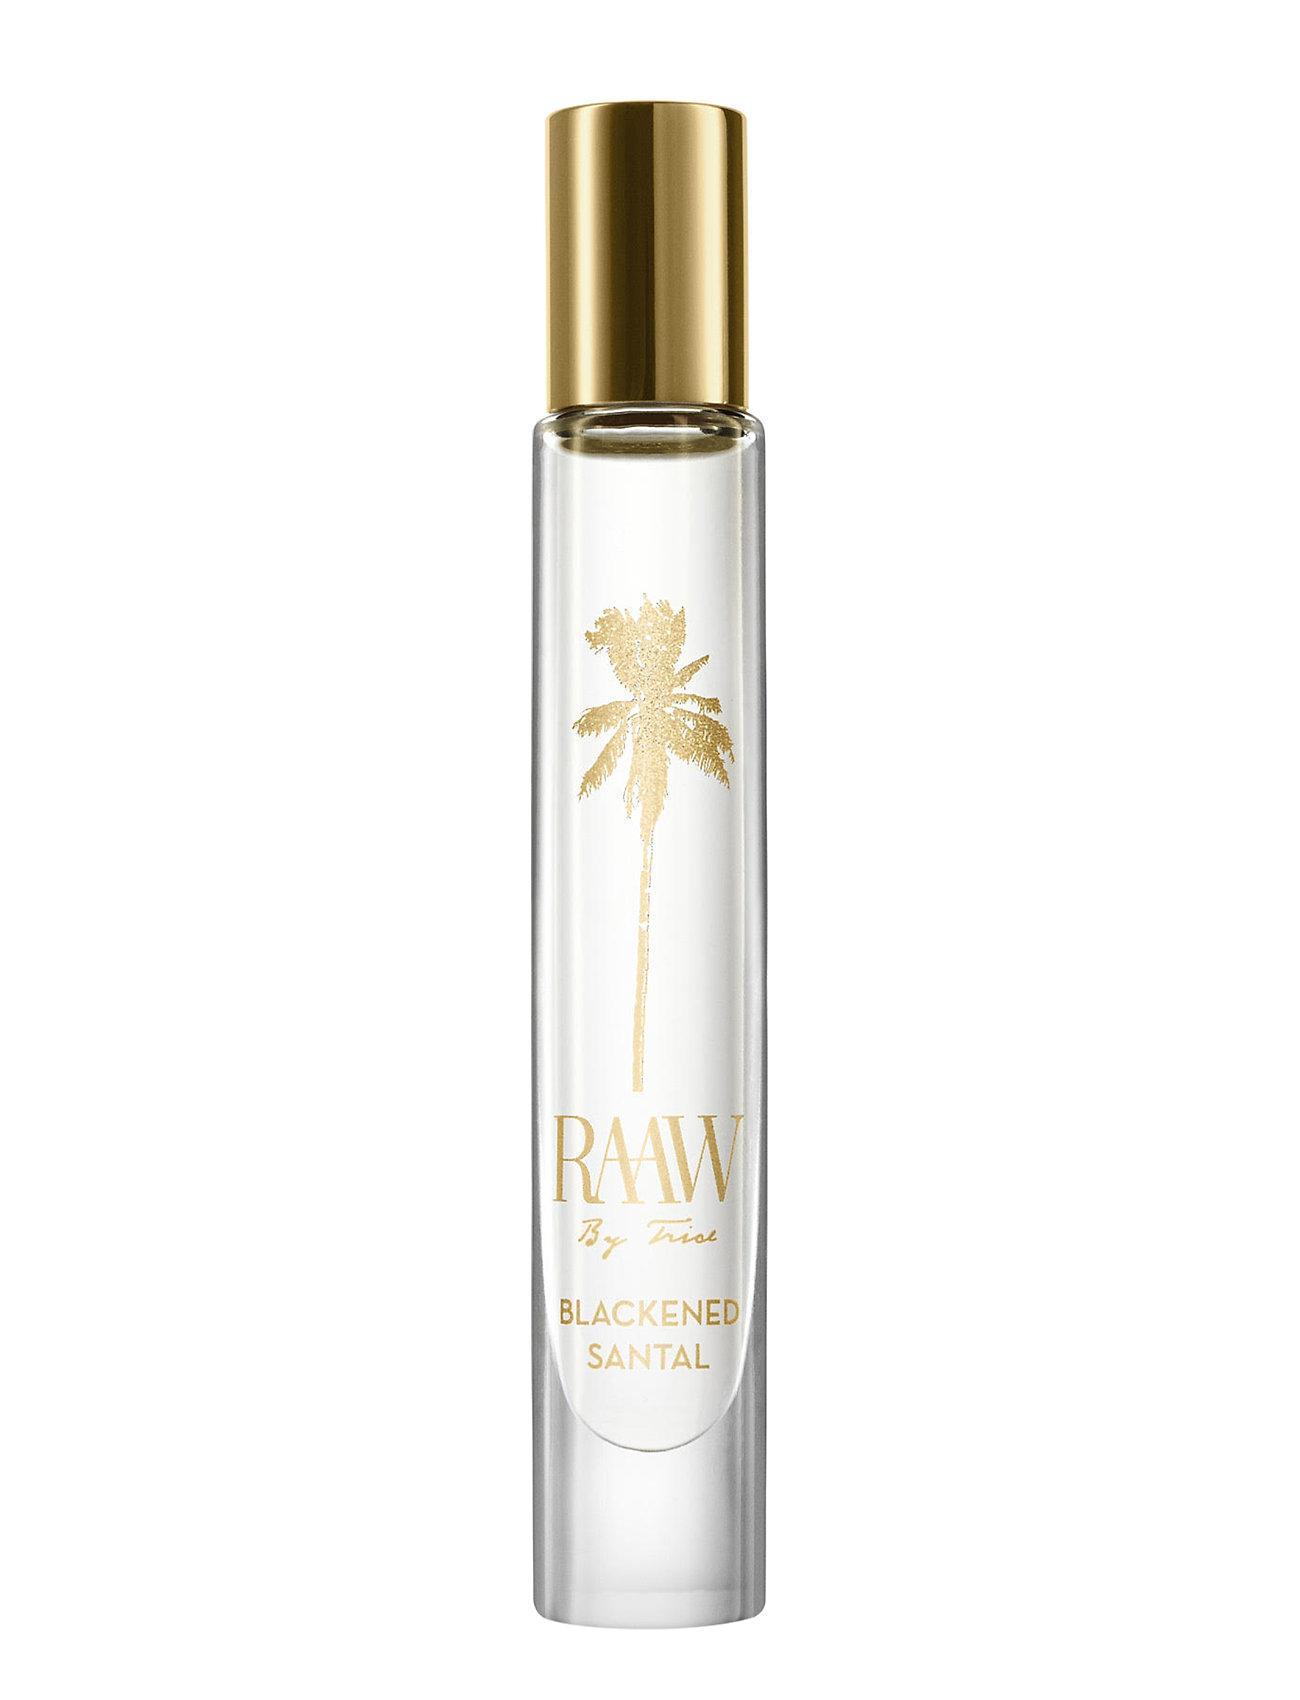 Raaw by Trice Blackened Santal parfume oil